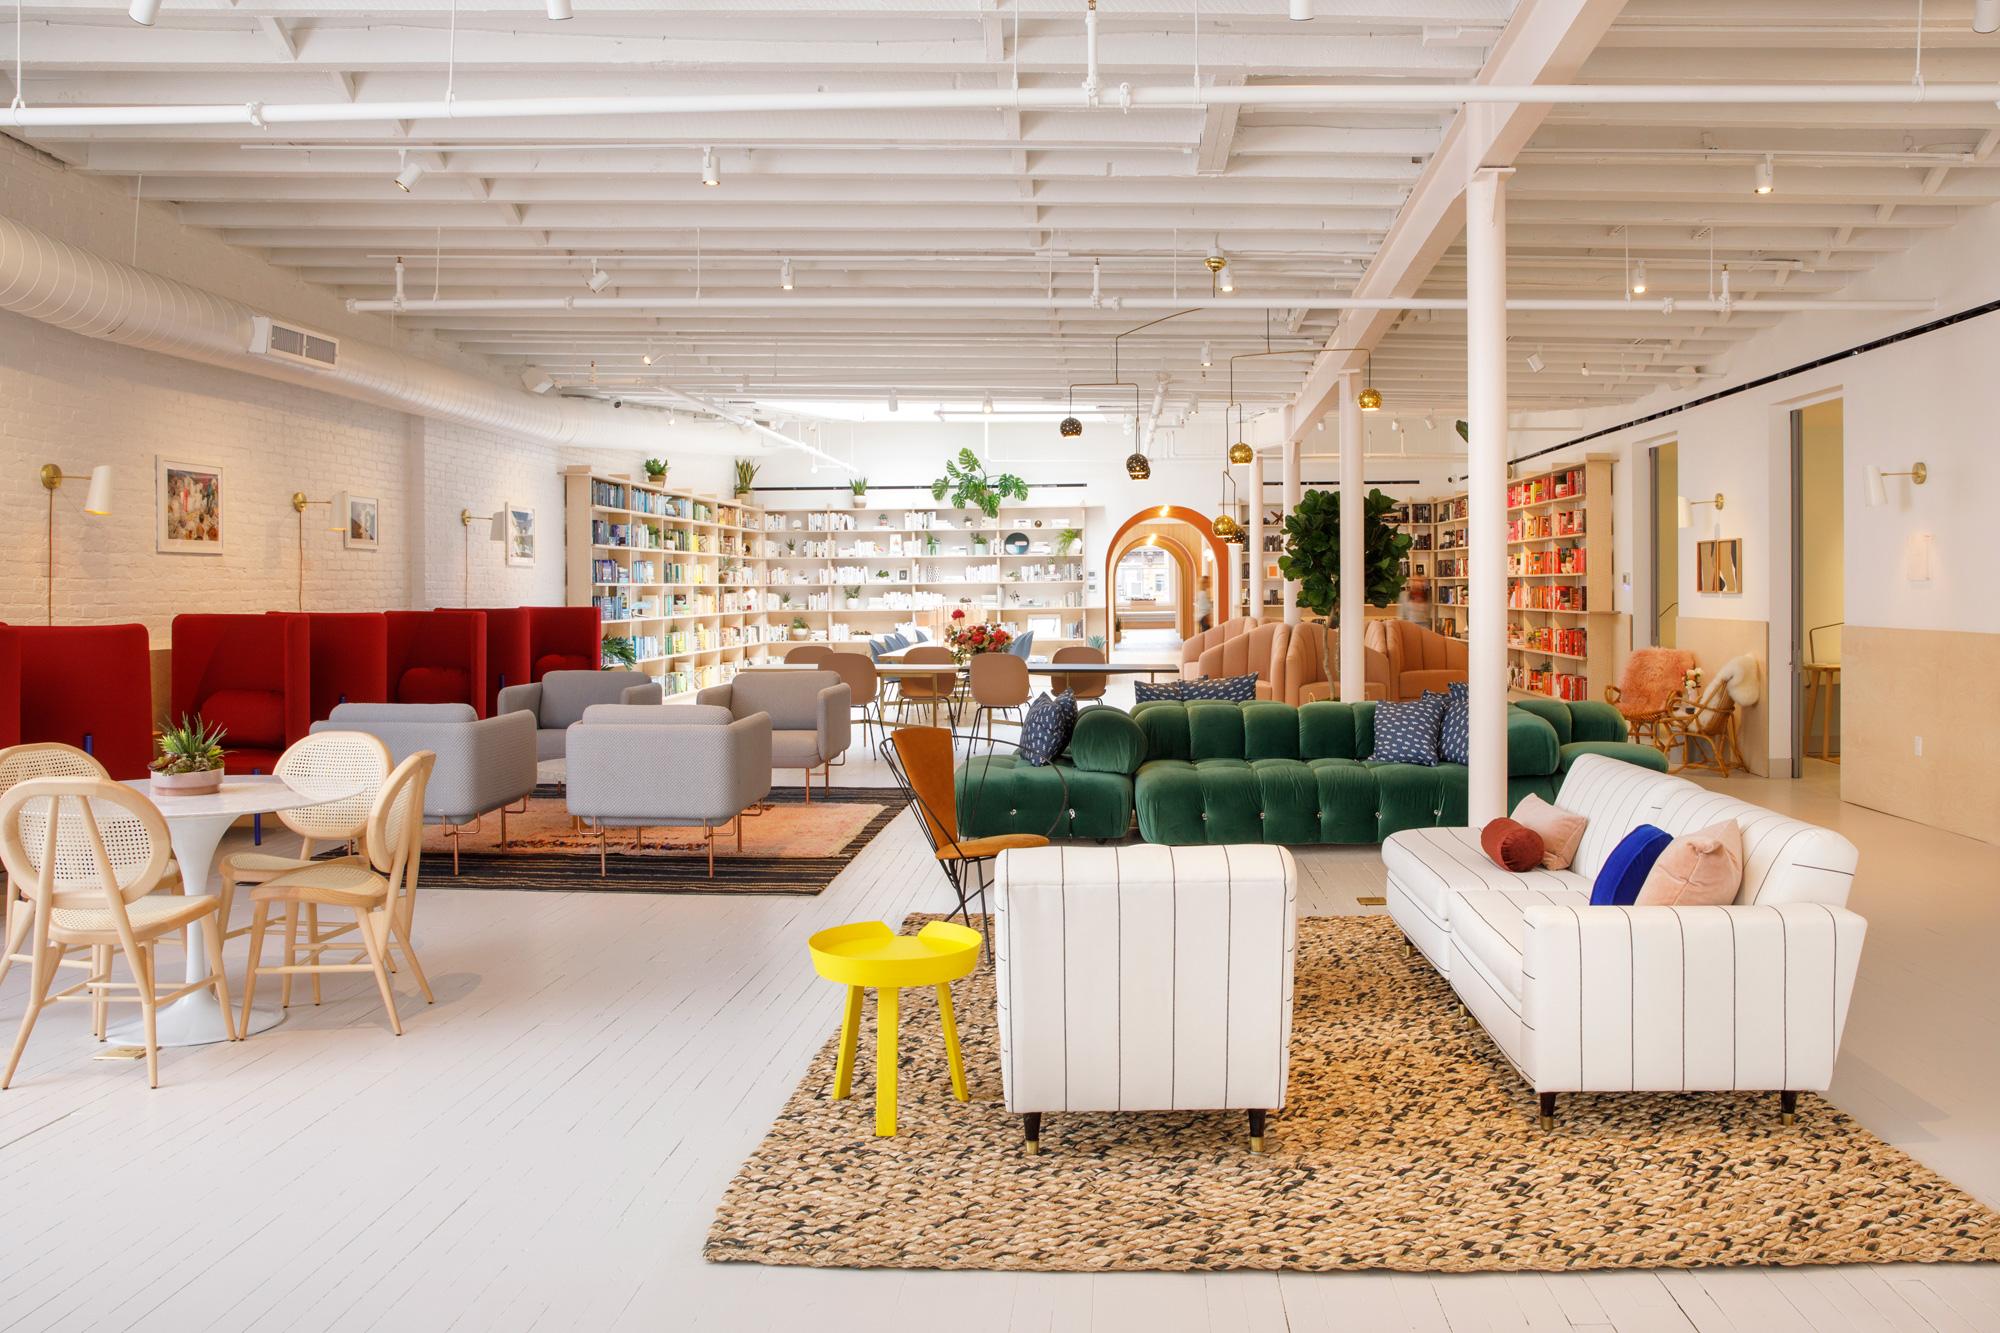 Designs Of The Interior Peek Inside The Wing's New Instagramworthy Soho Social Club